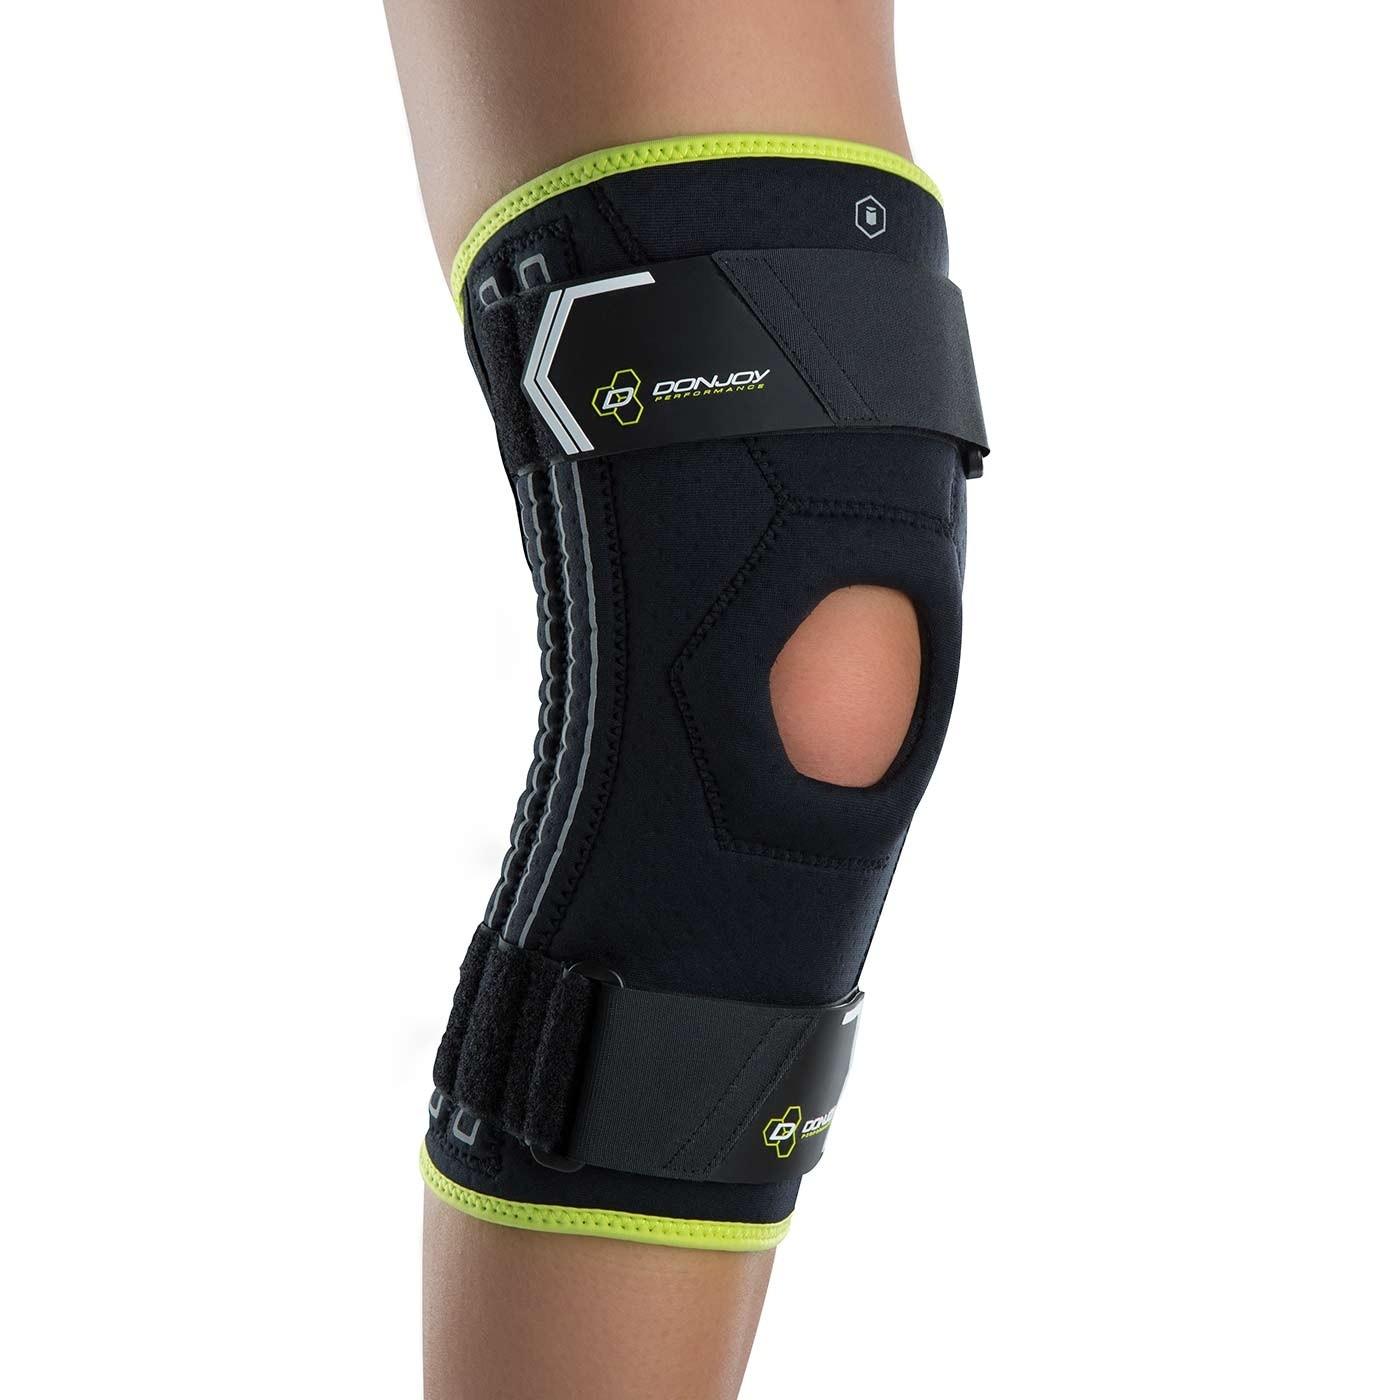 d0cad2d5a0 DonJoy Performance Stabilizing Knee Sleeve